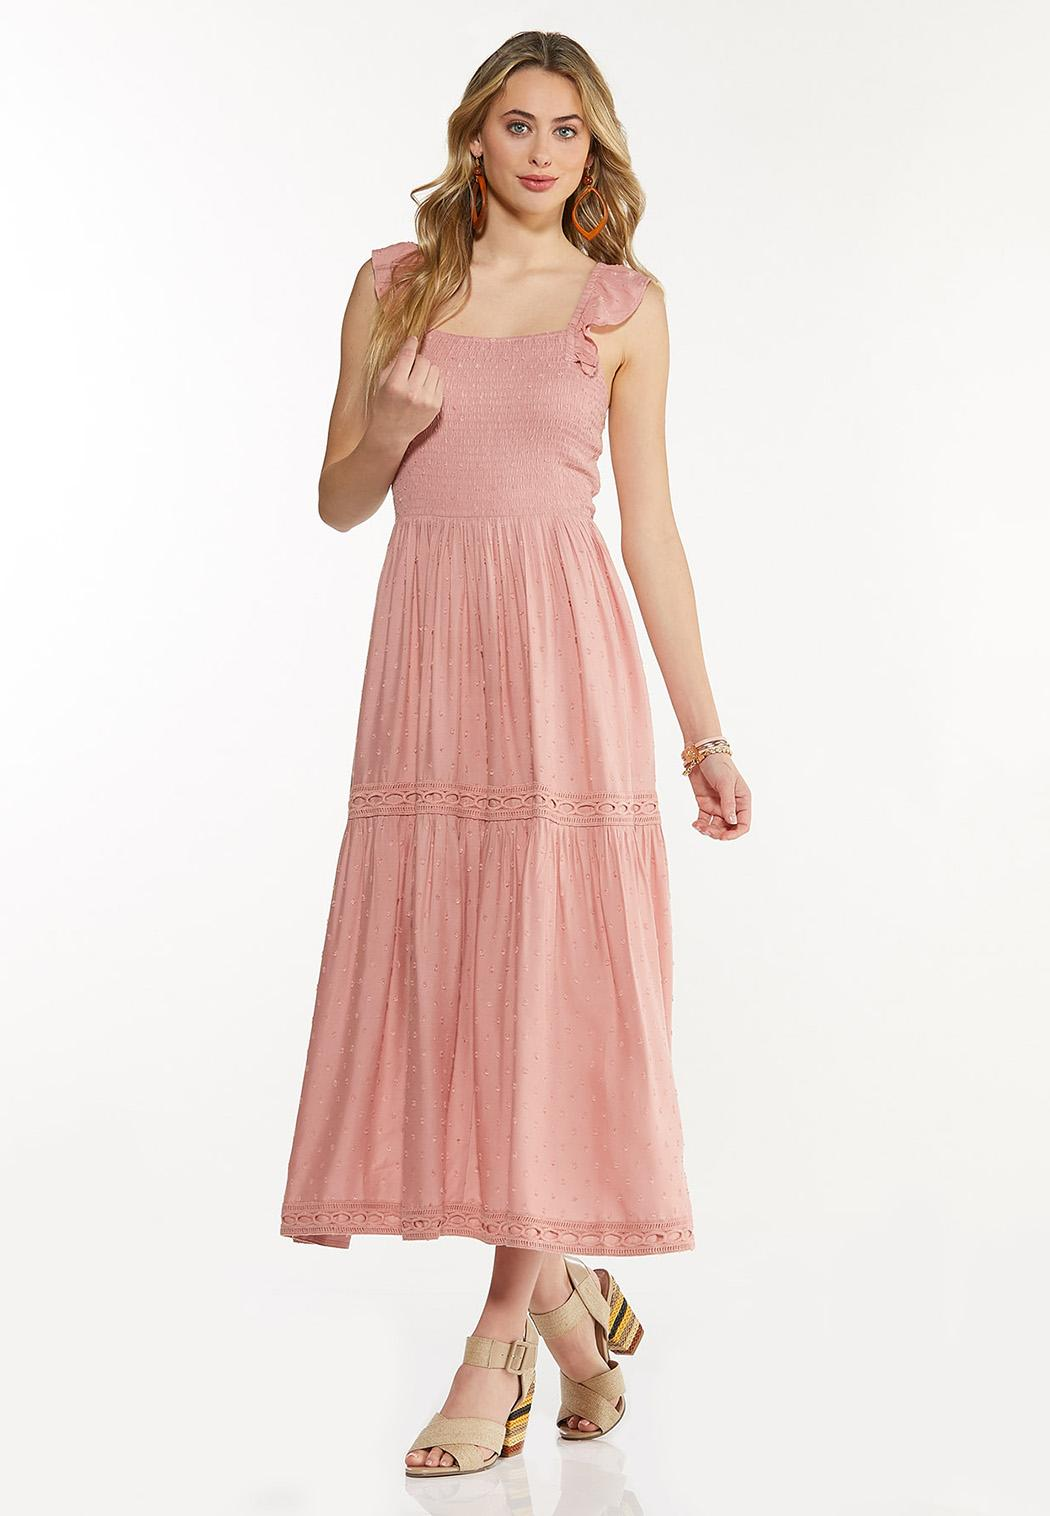 Smocked Blush Midi Dress